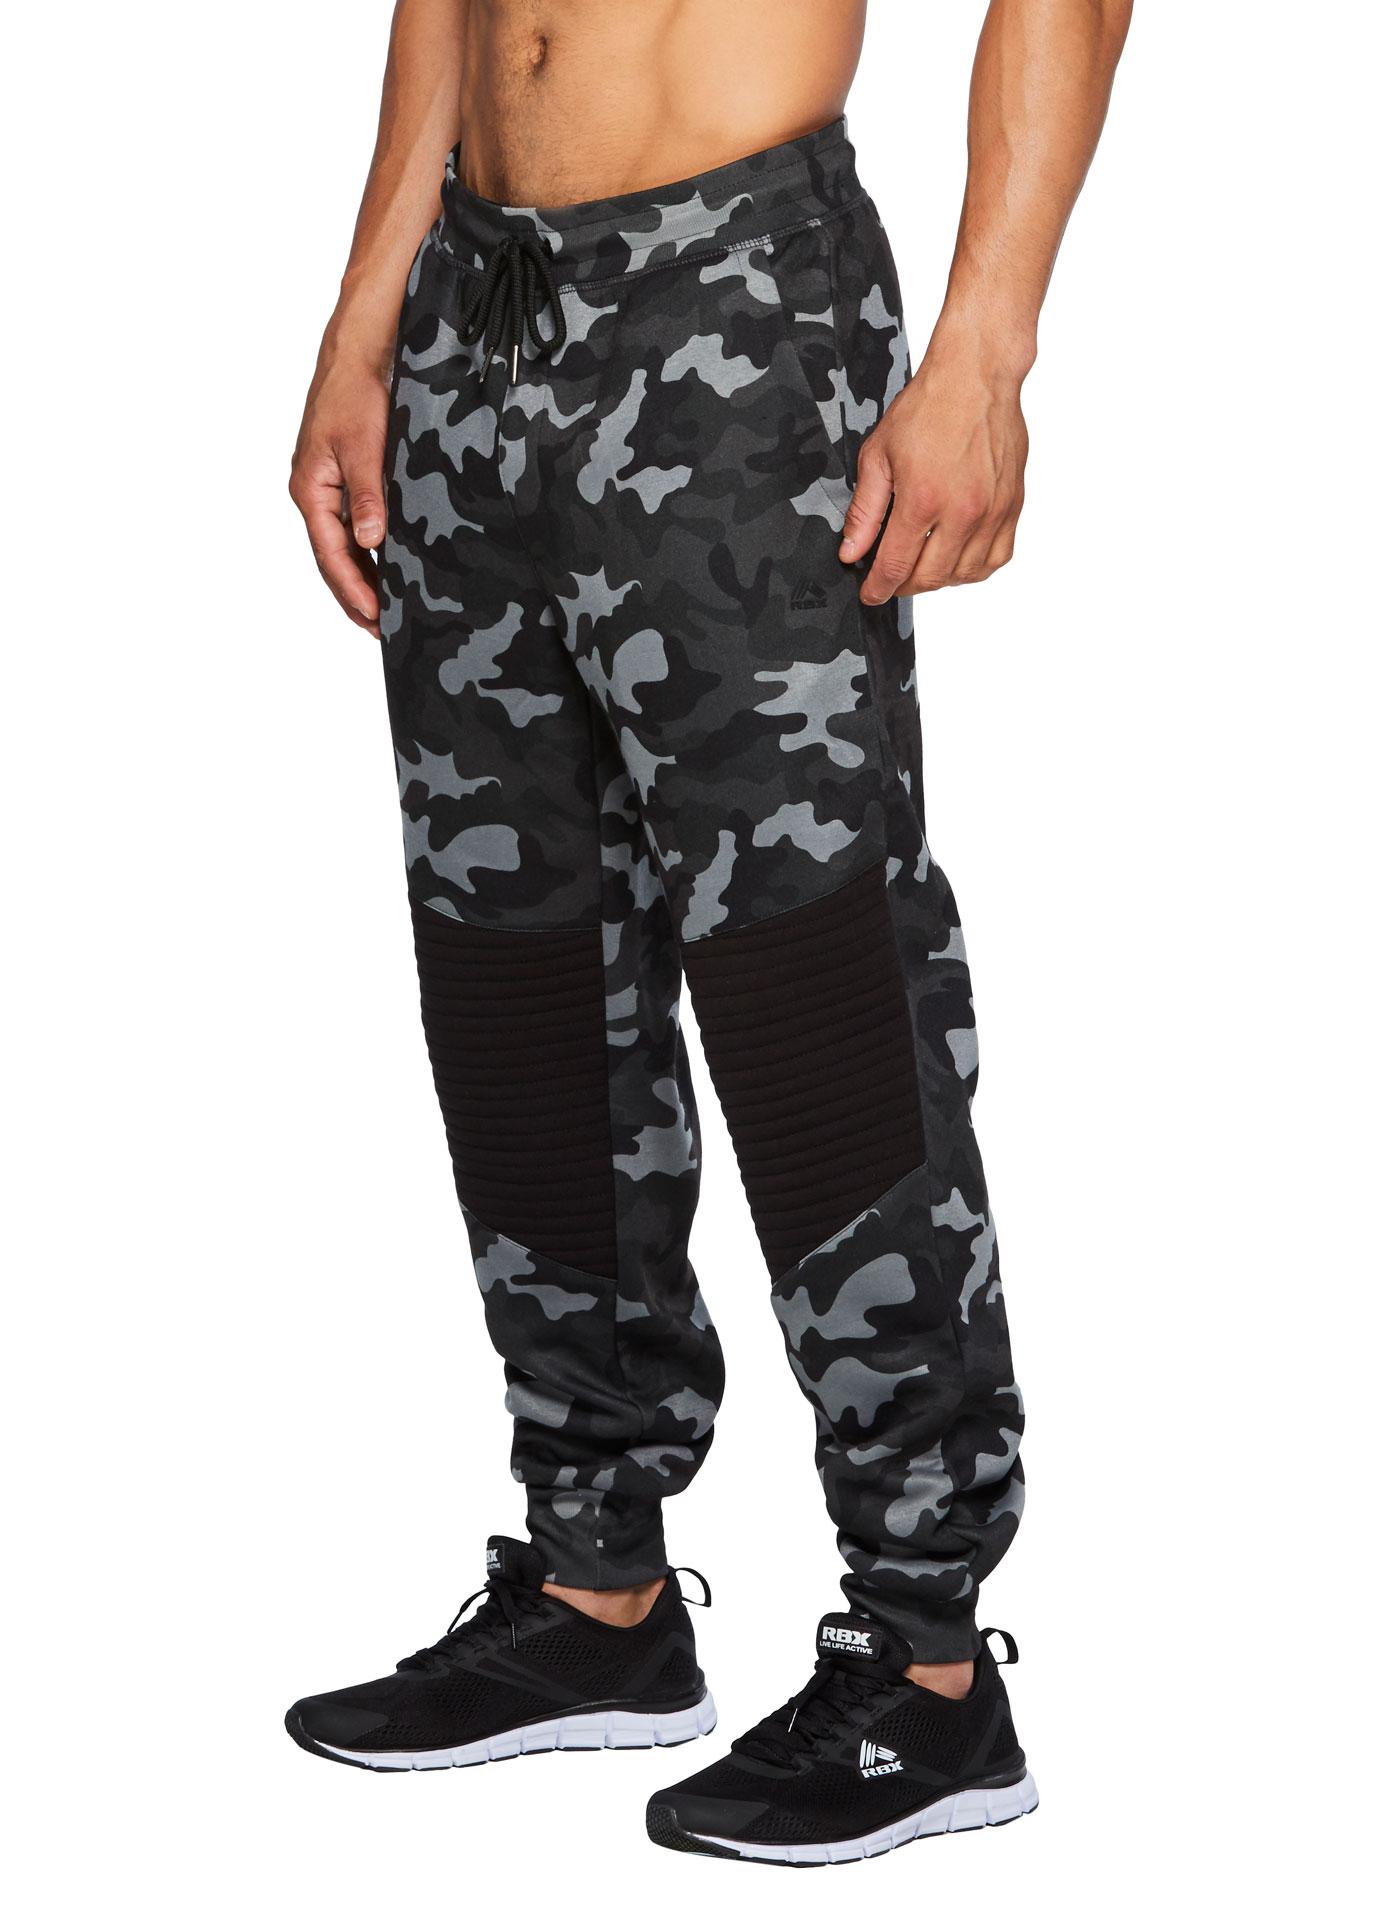 RBX Active Men's Jogger with Porkchop Pockets